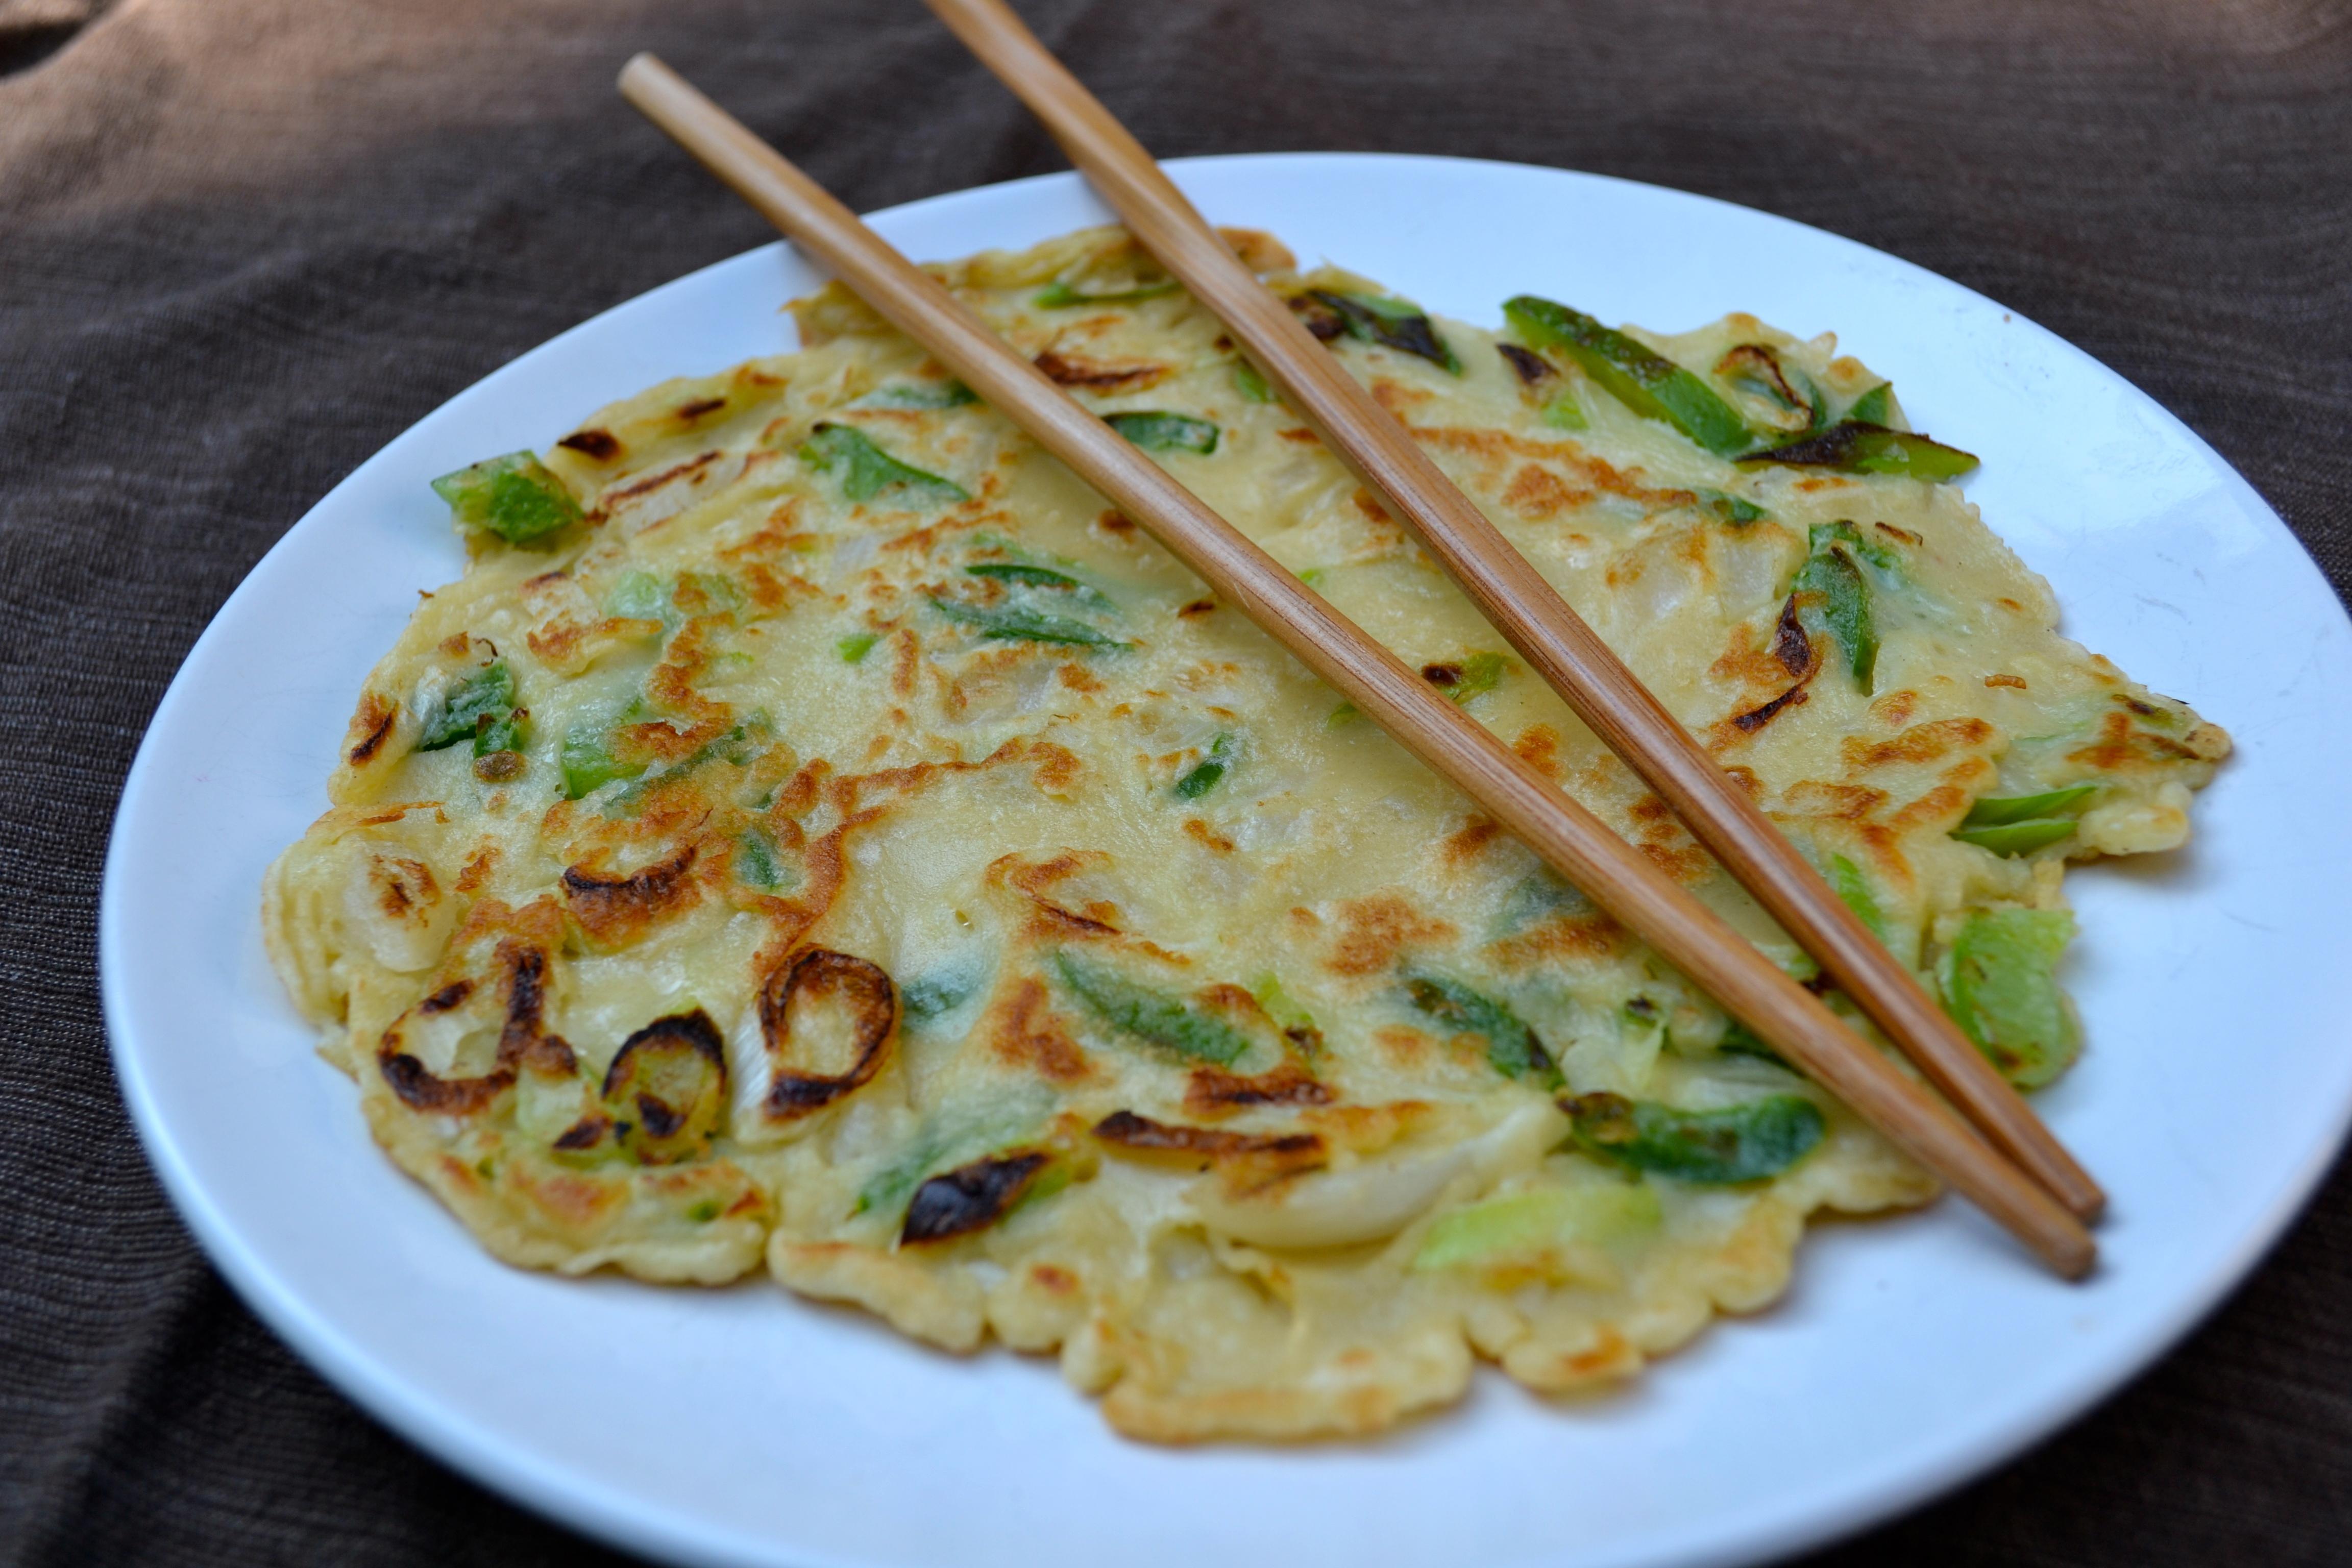 Jalapeno And Green Onion Pancake Lushesfood